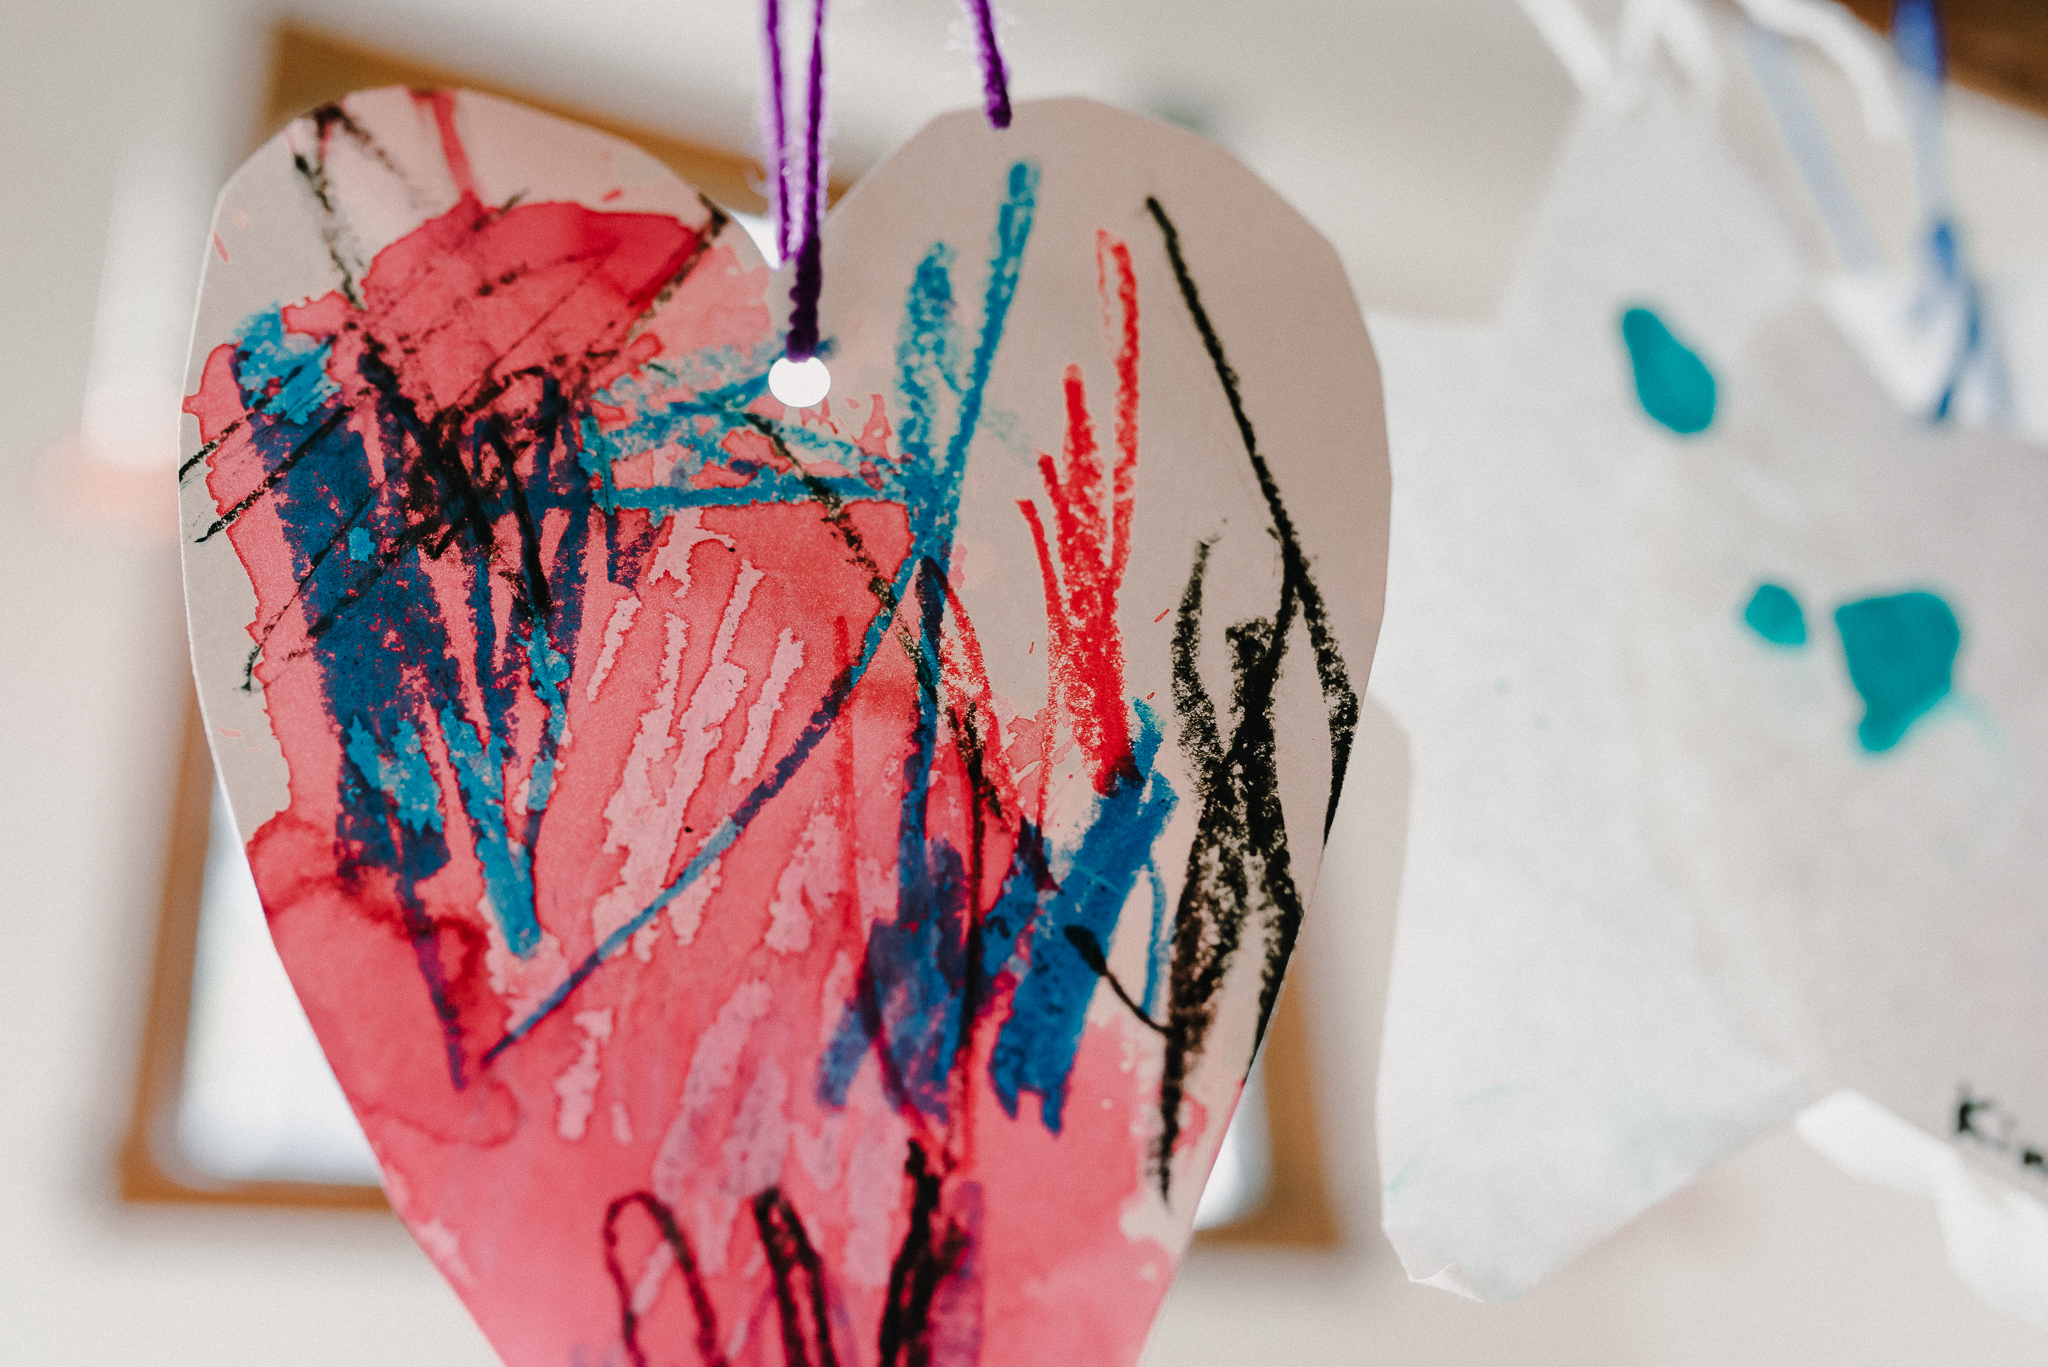 University-Ravenna Cooperative Preschool : Mixed media heart art - watercolor and crayon